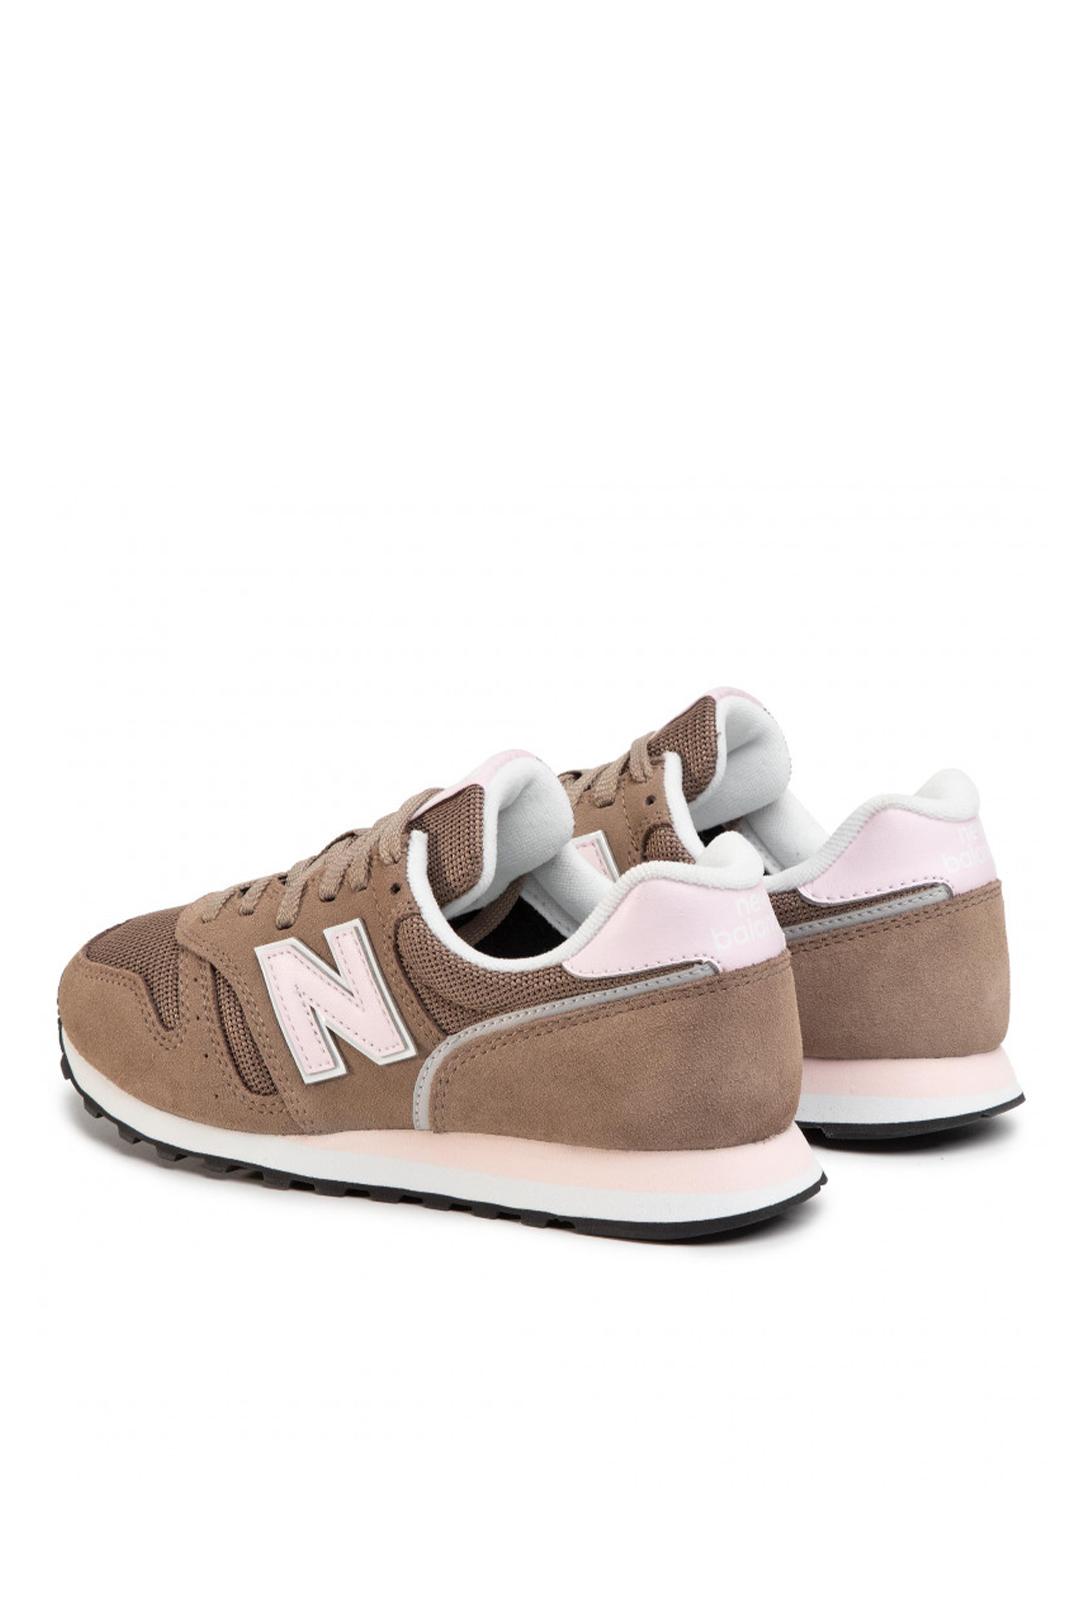 Chaussures  New balance WL373BB2 bb2